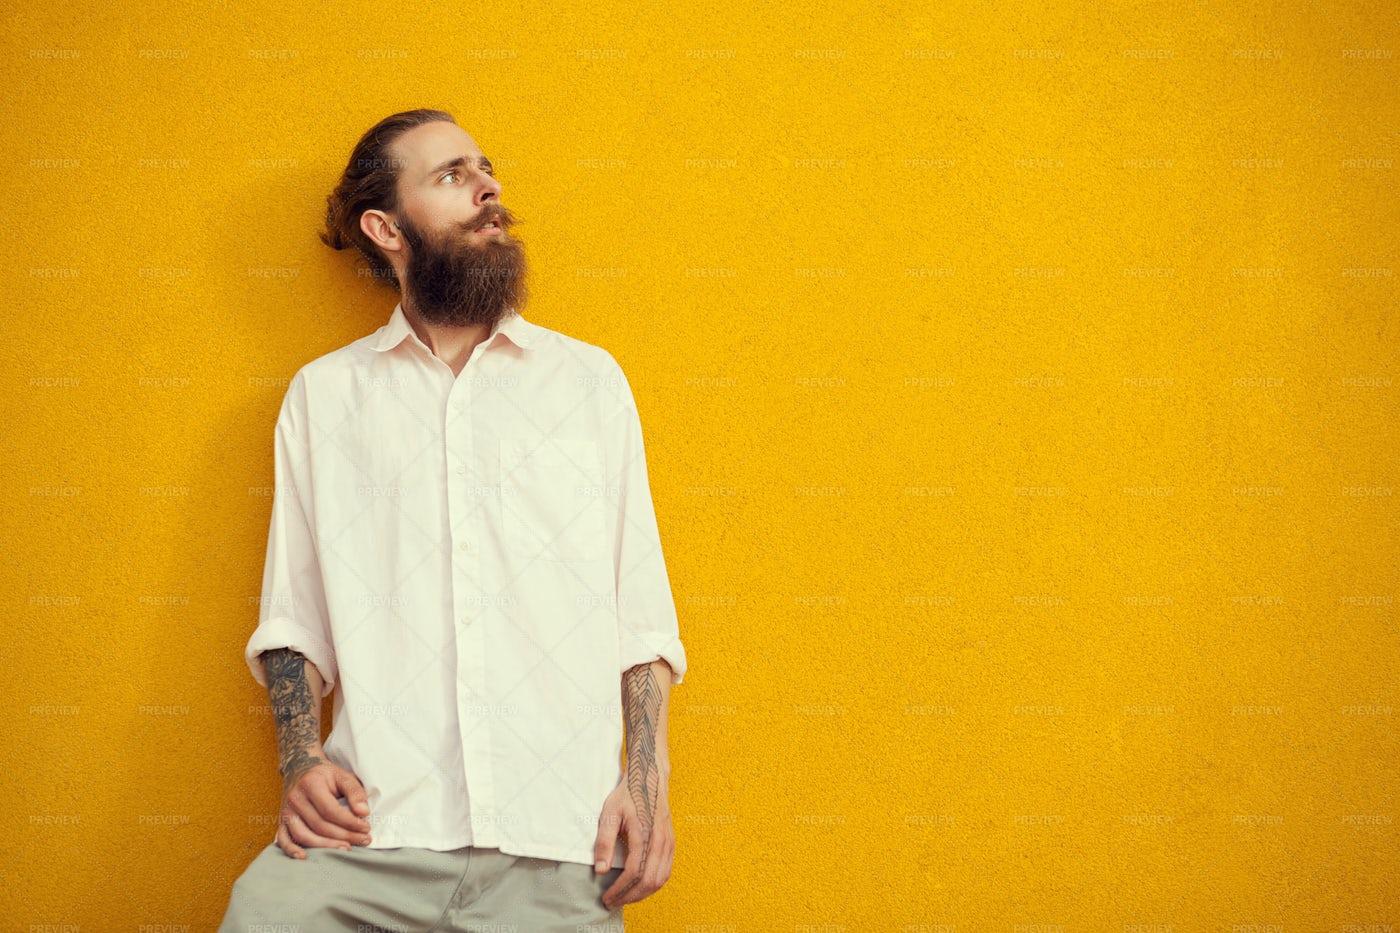 Bearded Man With Tattoos: Stock Photos